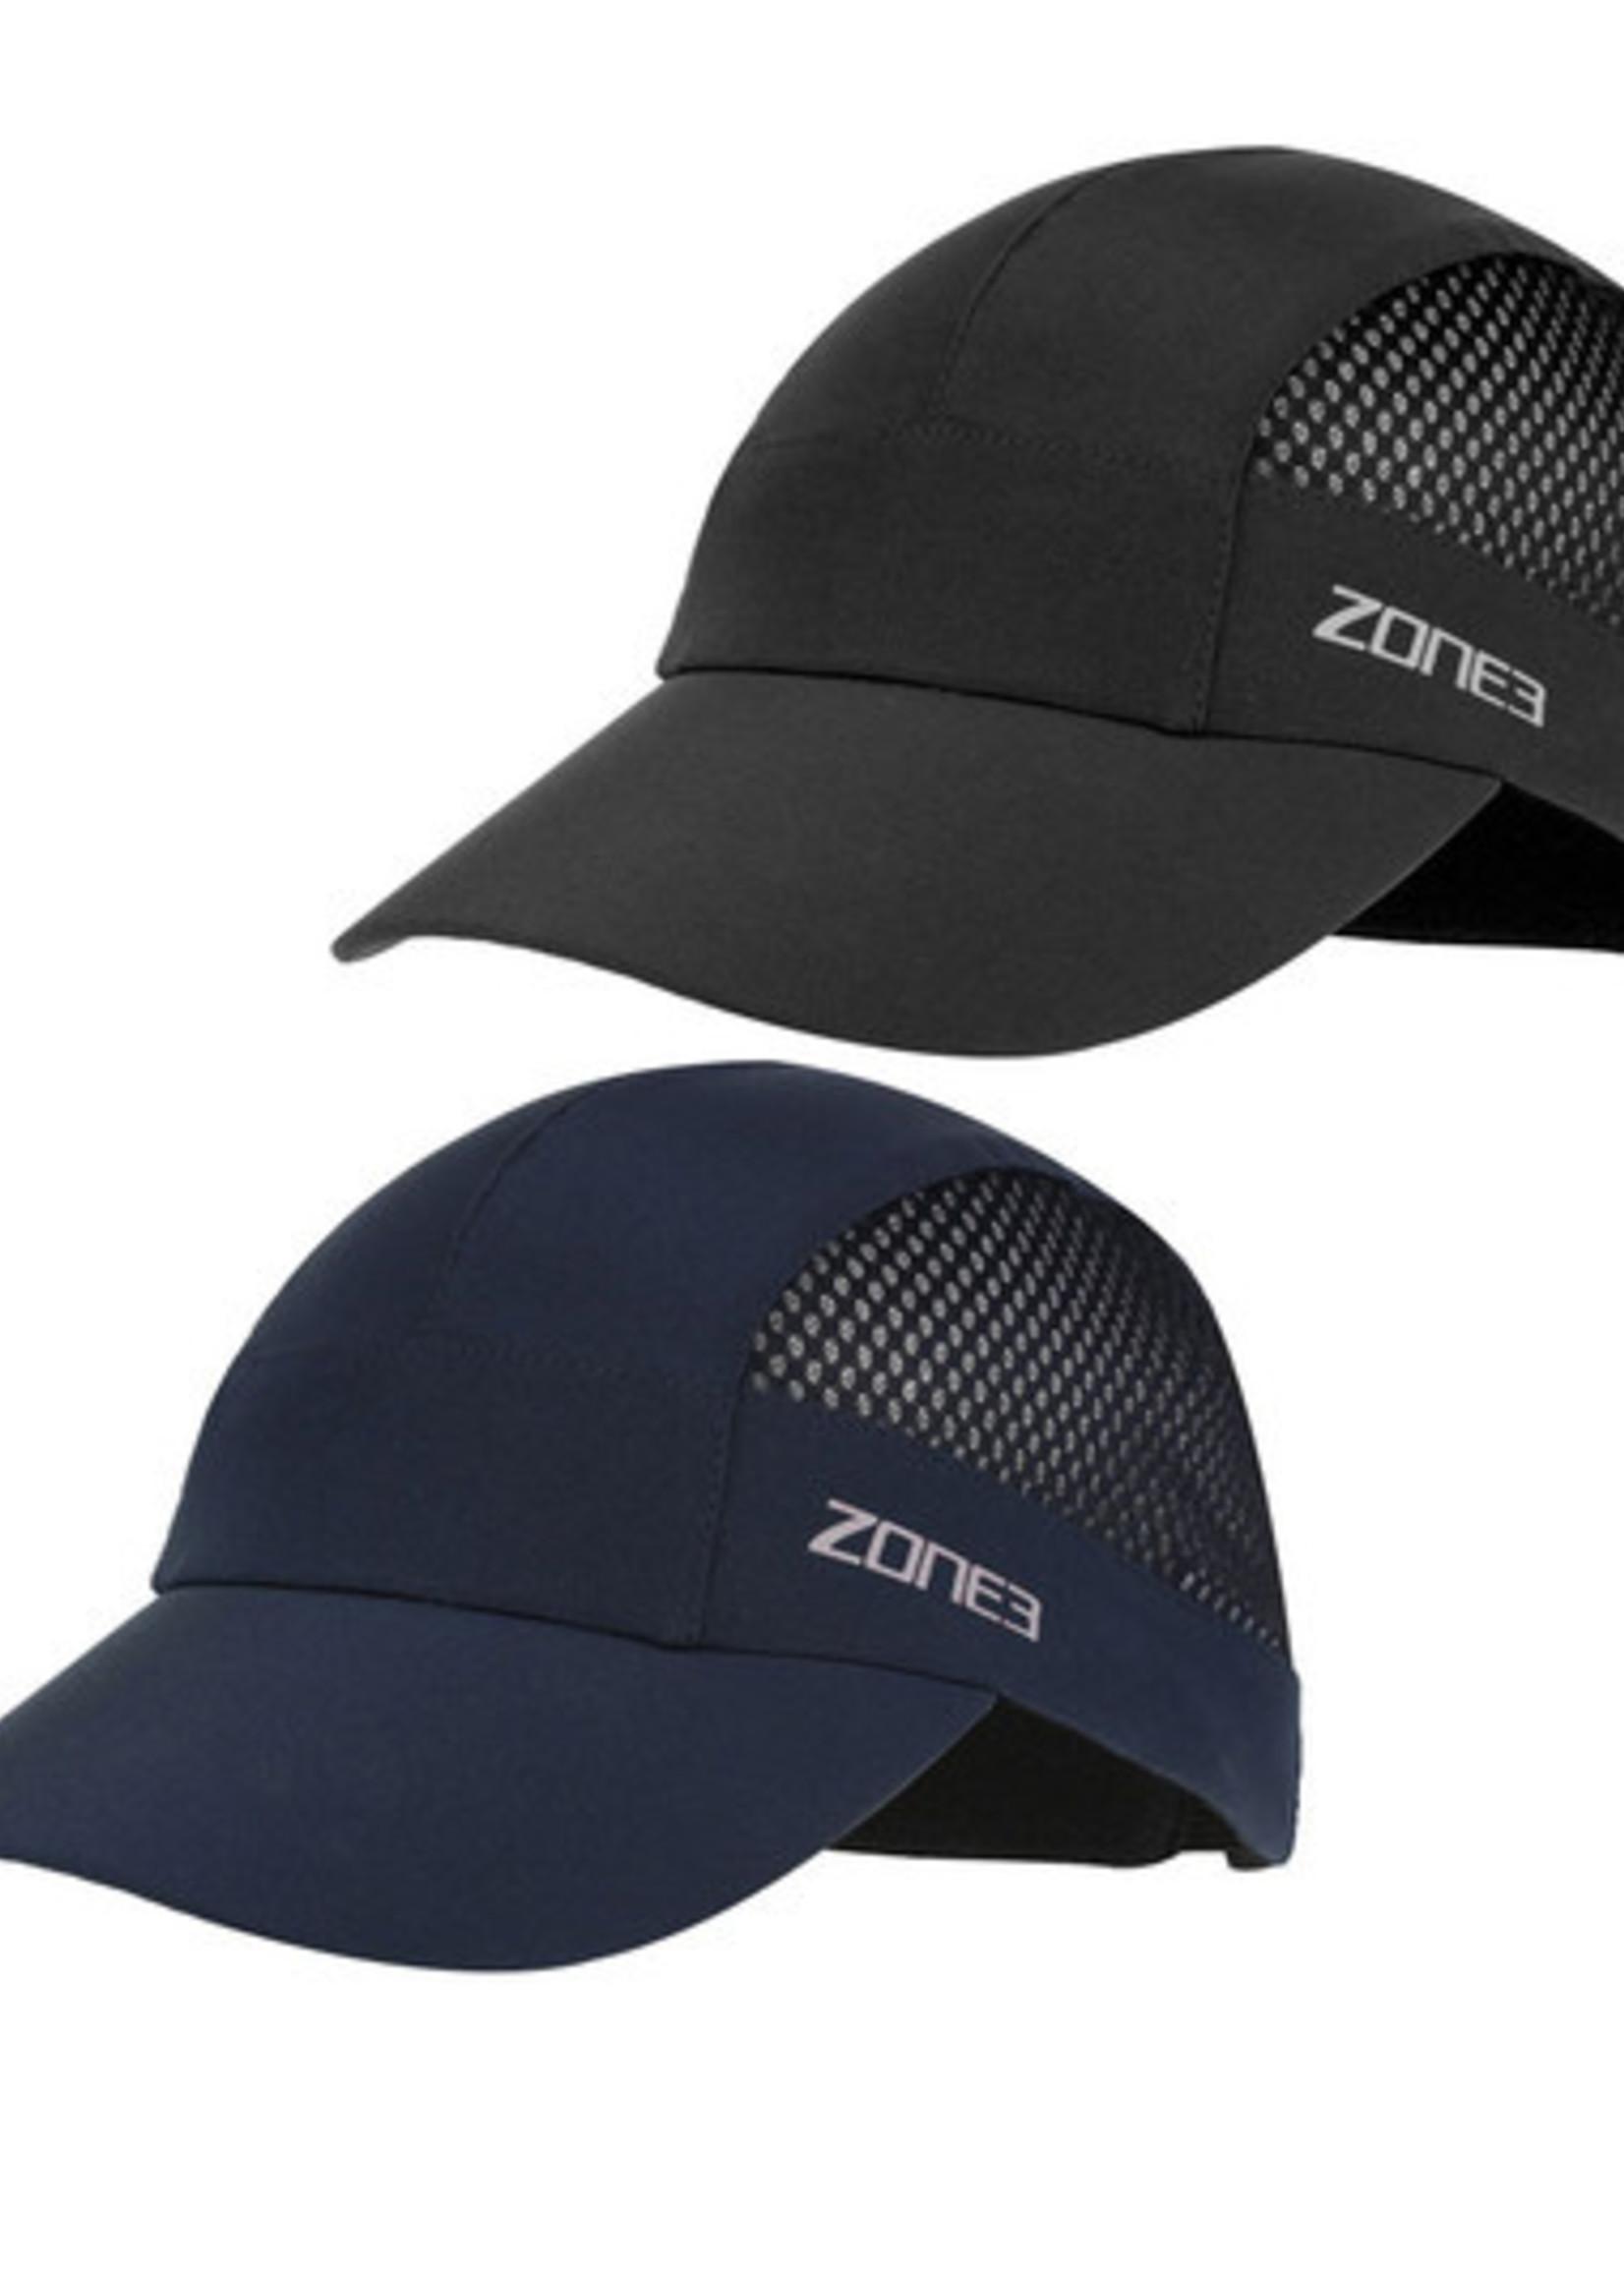 Zone 3 Zone 3 Lightweight Run Cap